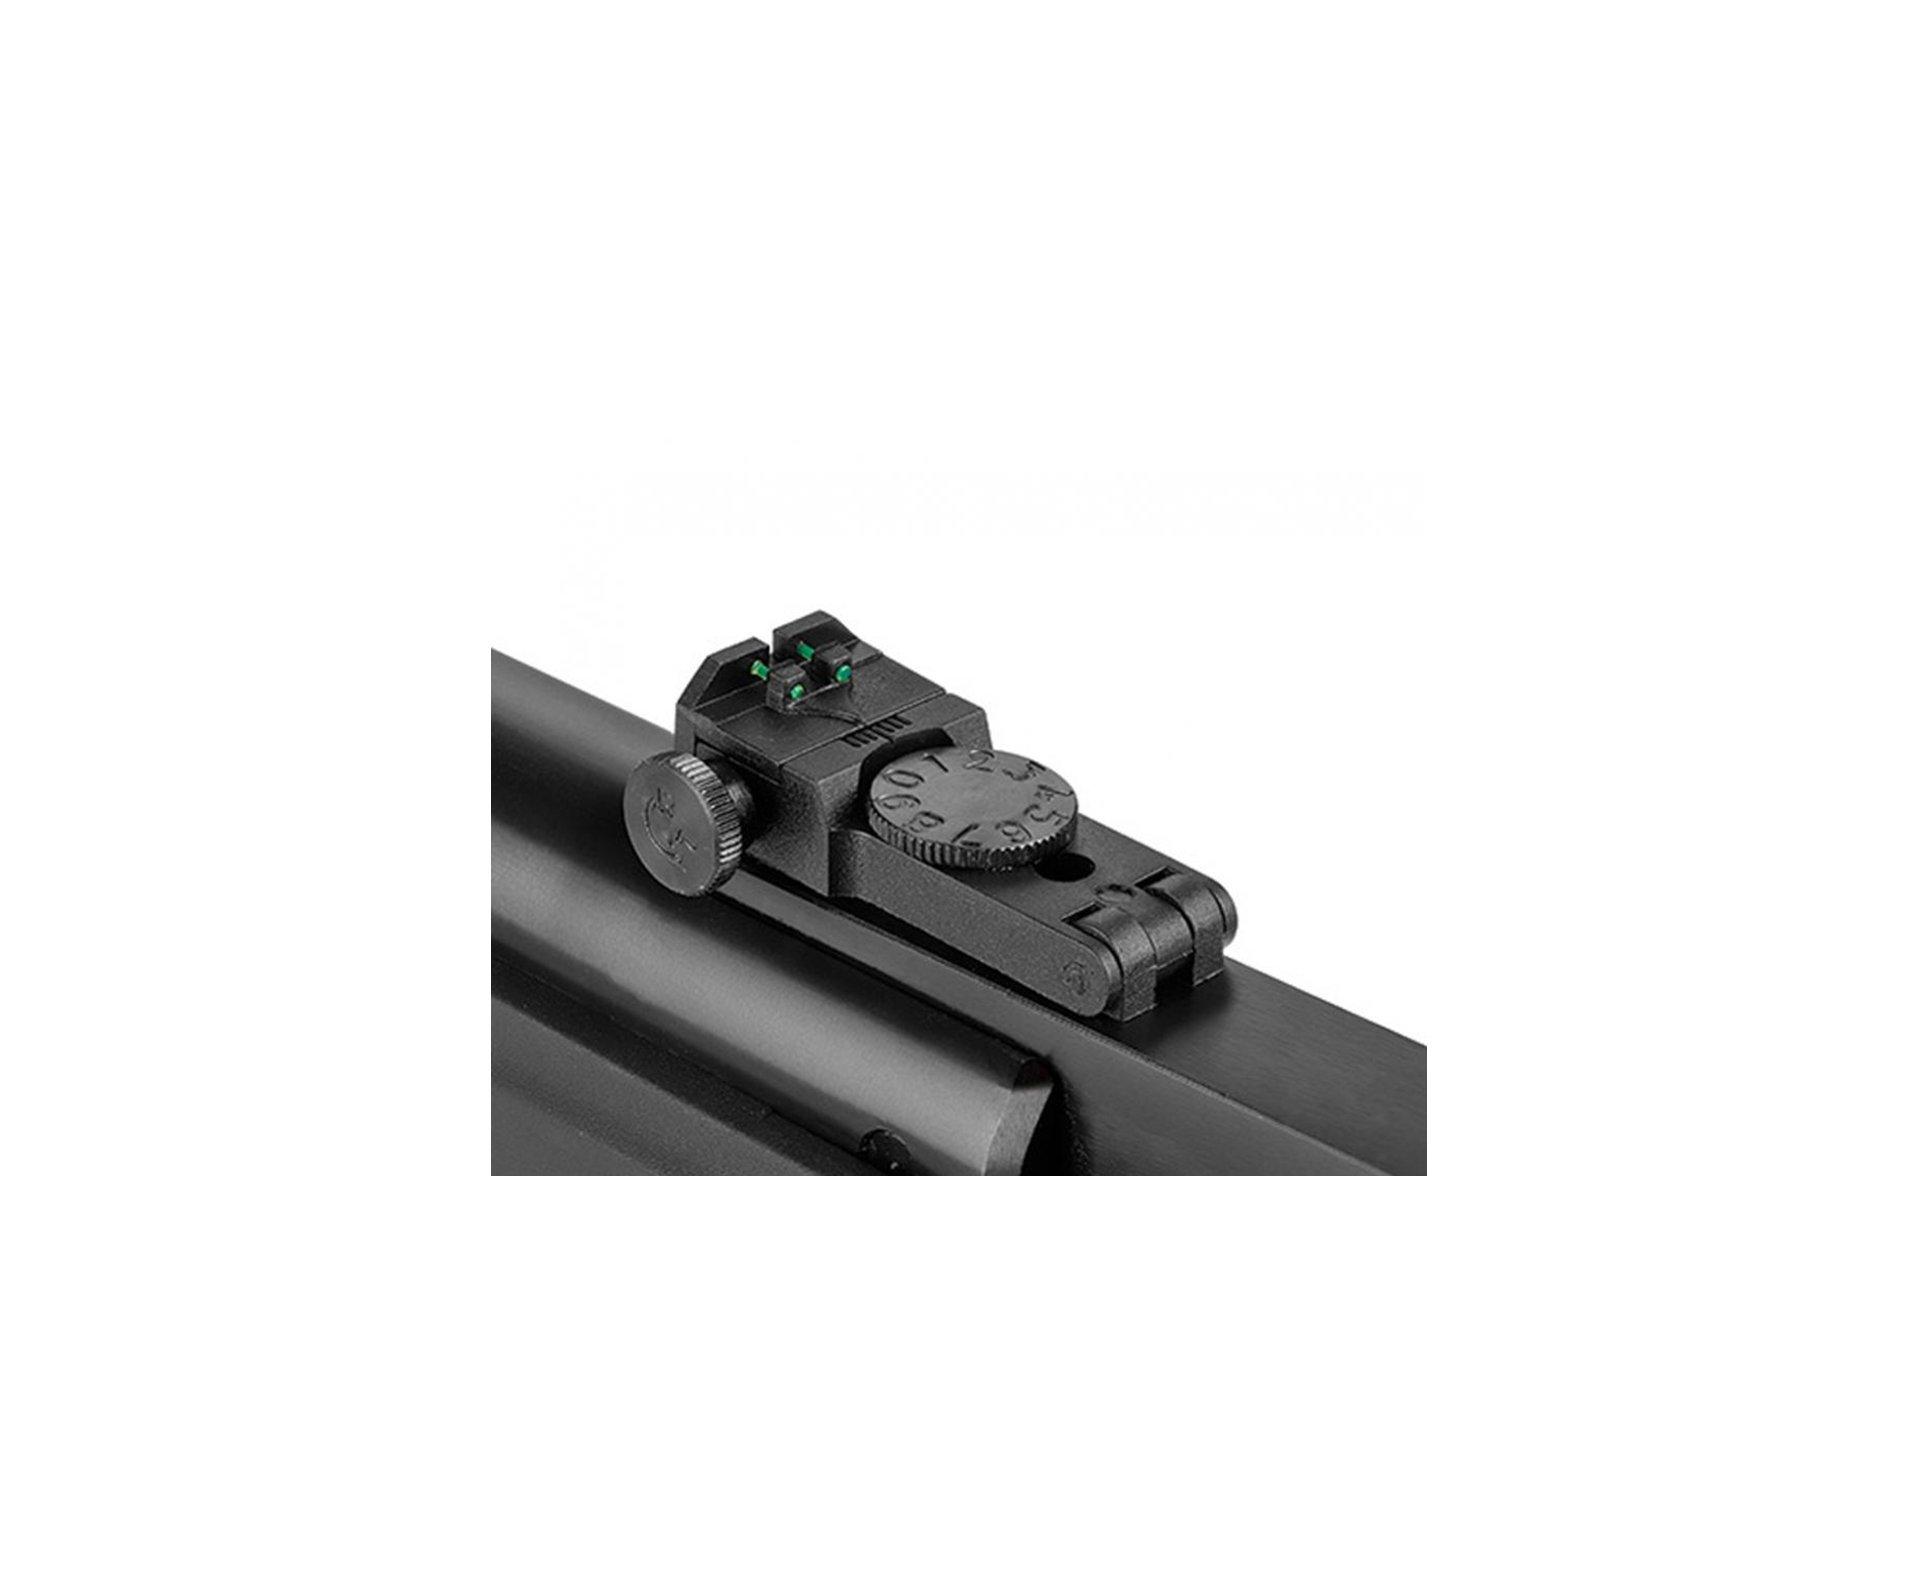 Carabina De Pressão Hatsan Ht 80 - Calibre 5,5 Mm - Sistema Sas